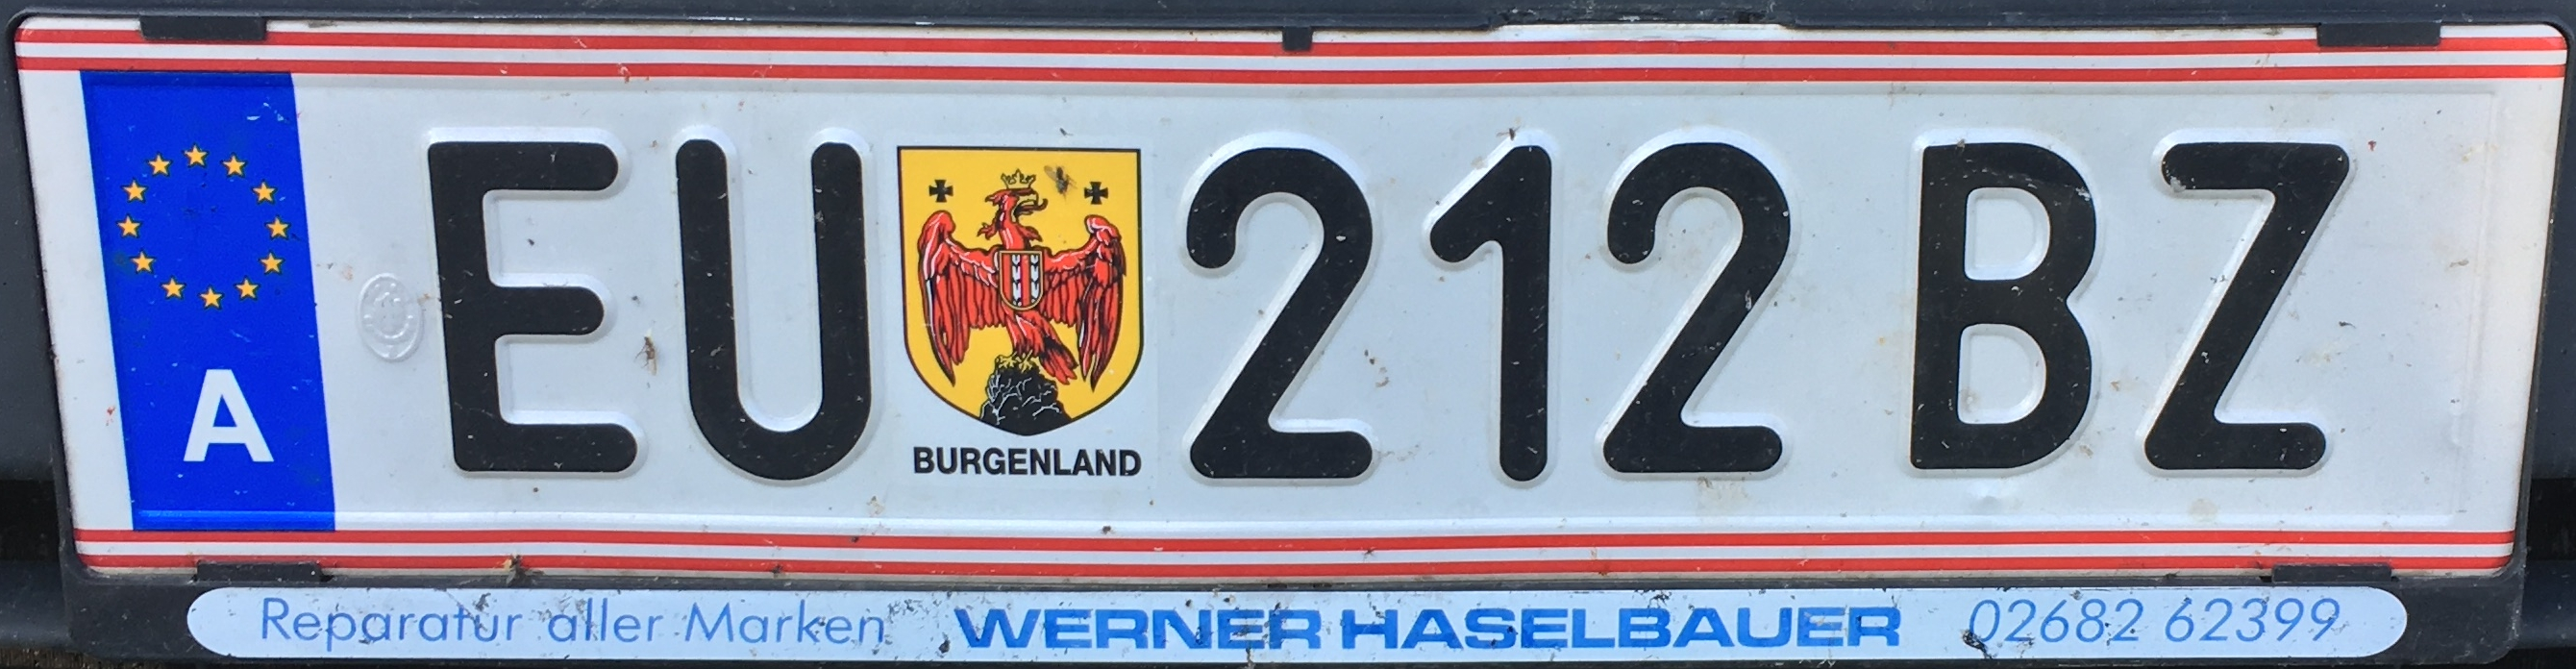 Registrační značka Rakousko - EU - Eisenstadt-venkov, foto: www.podalnici.cz